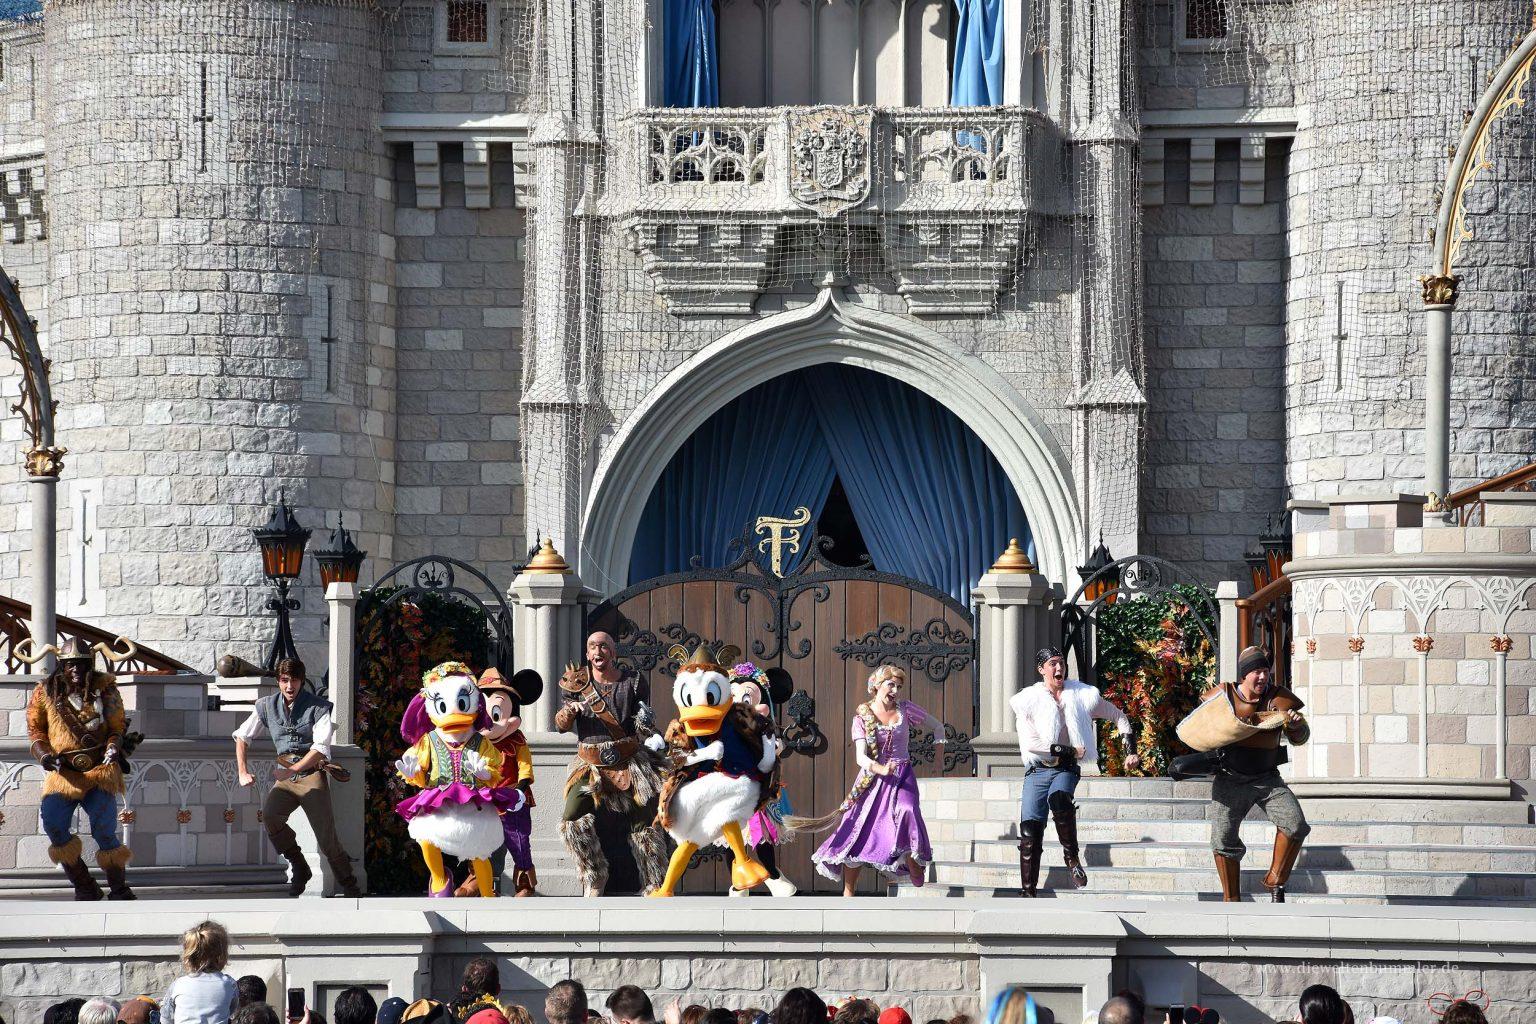 Disney-Charaktere tanzen vor dem Schloss